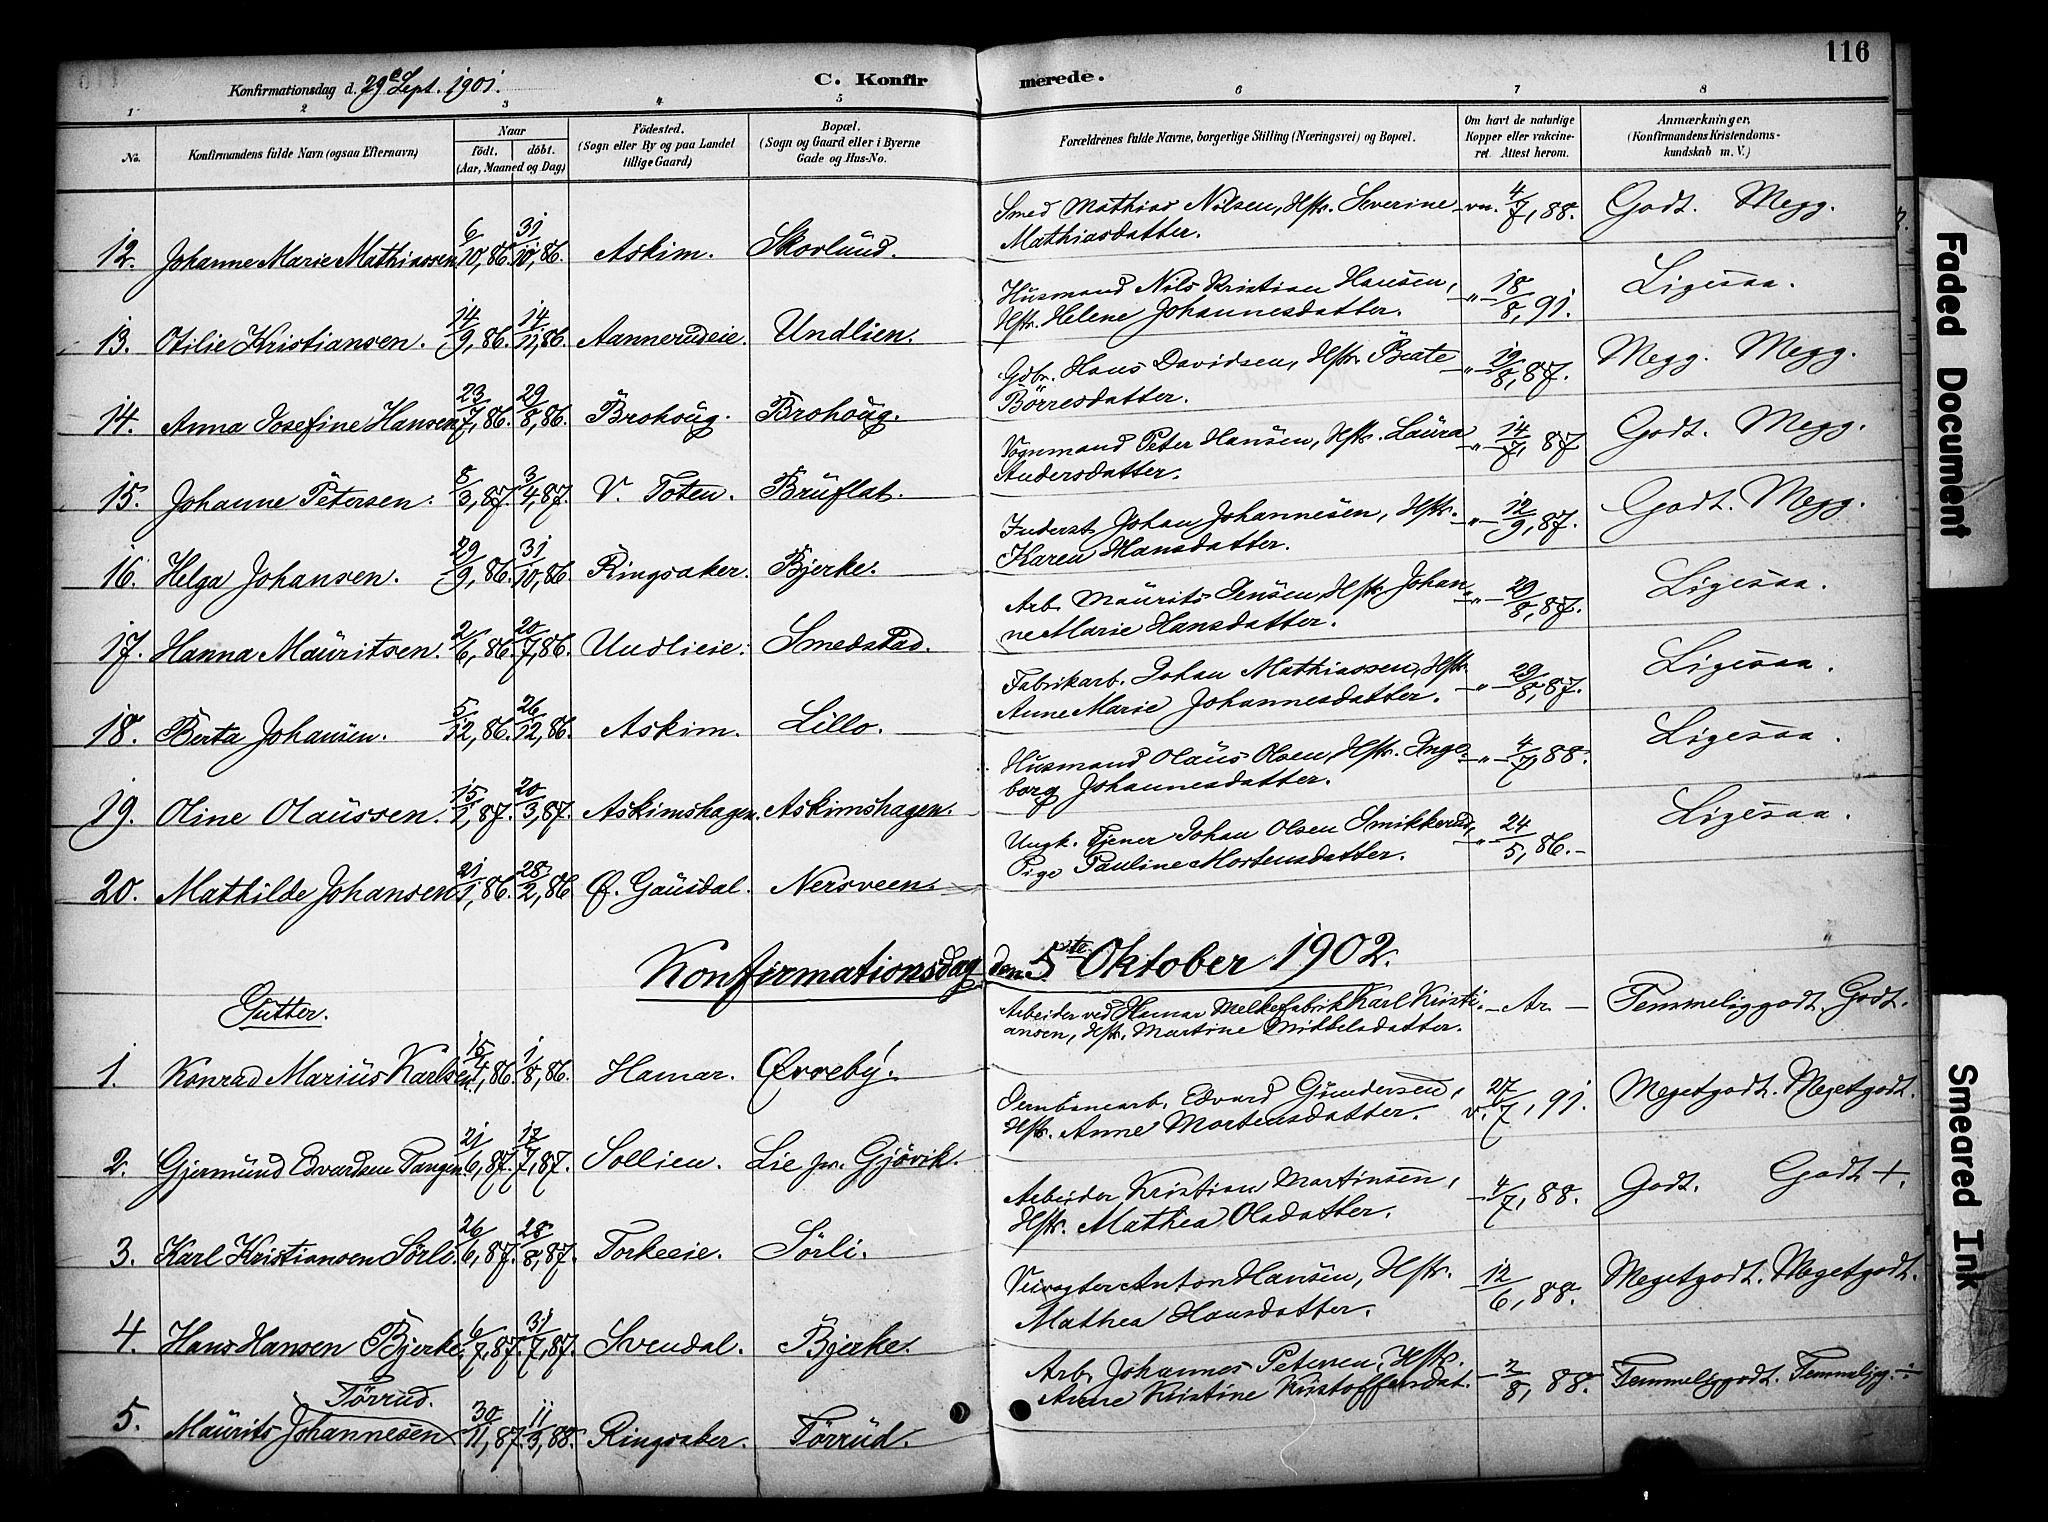 SAH, Vardal prestekontor, H/Ha/Haa/L0012: Ministerialbok nr. 12, 1893-1904, s. 116